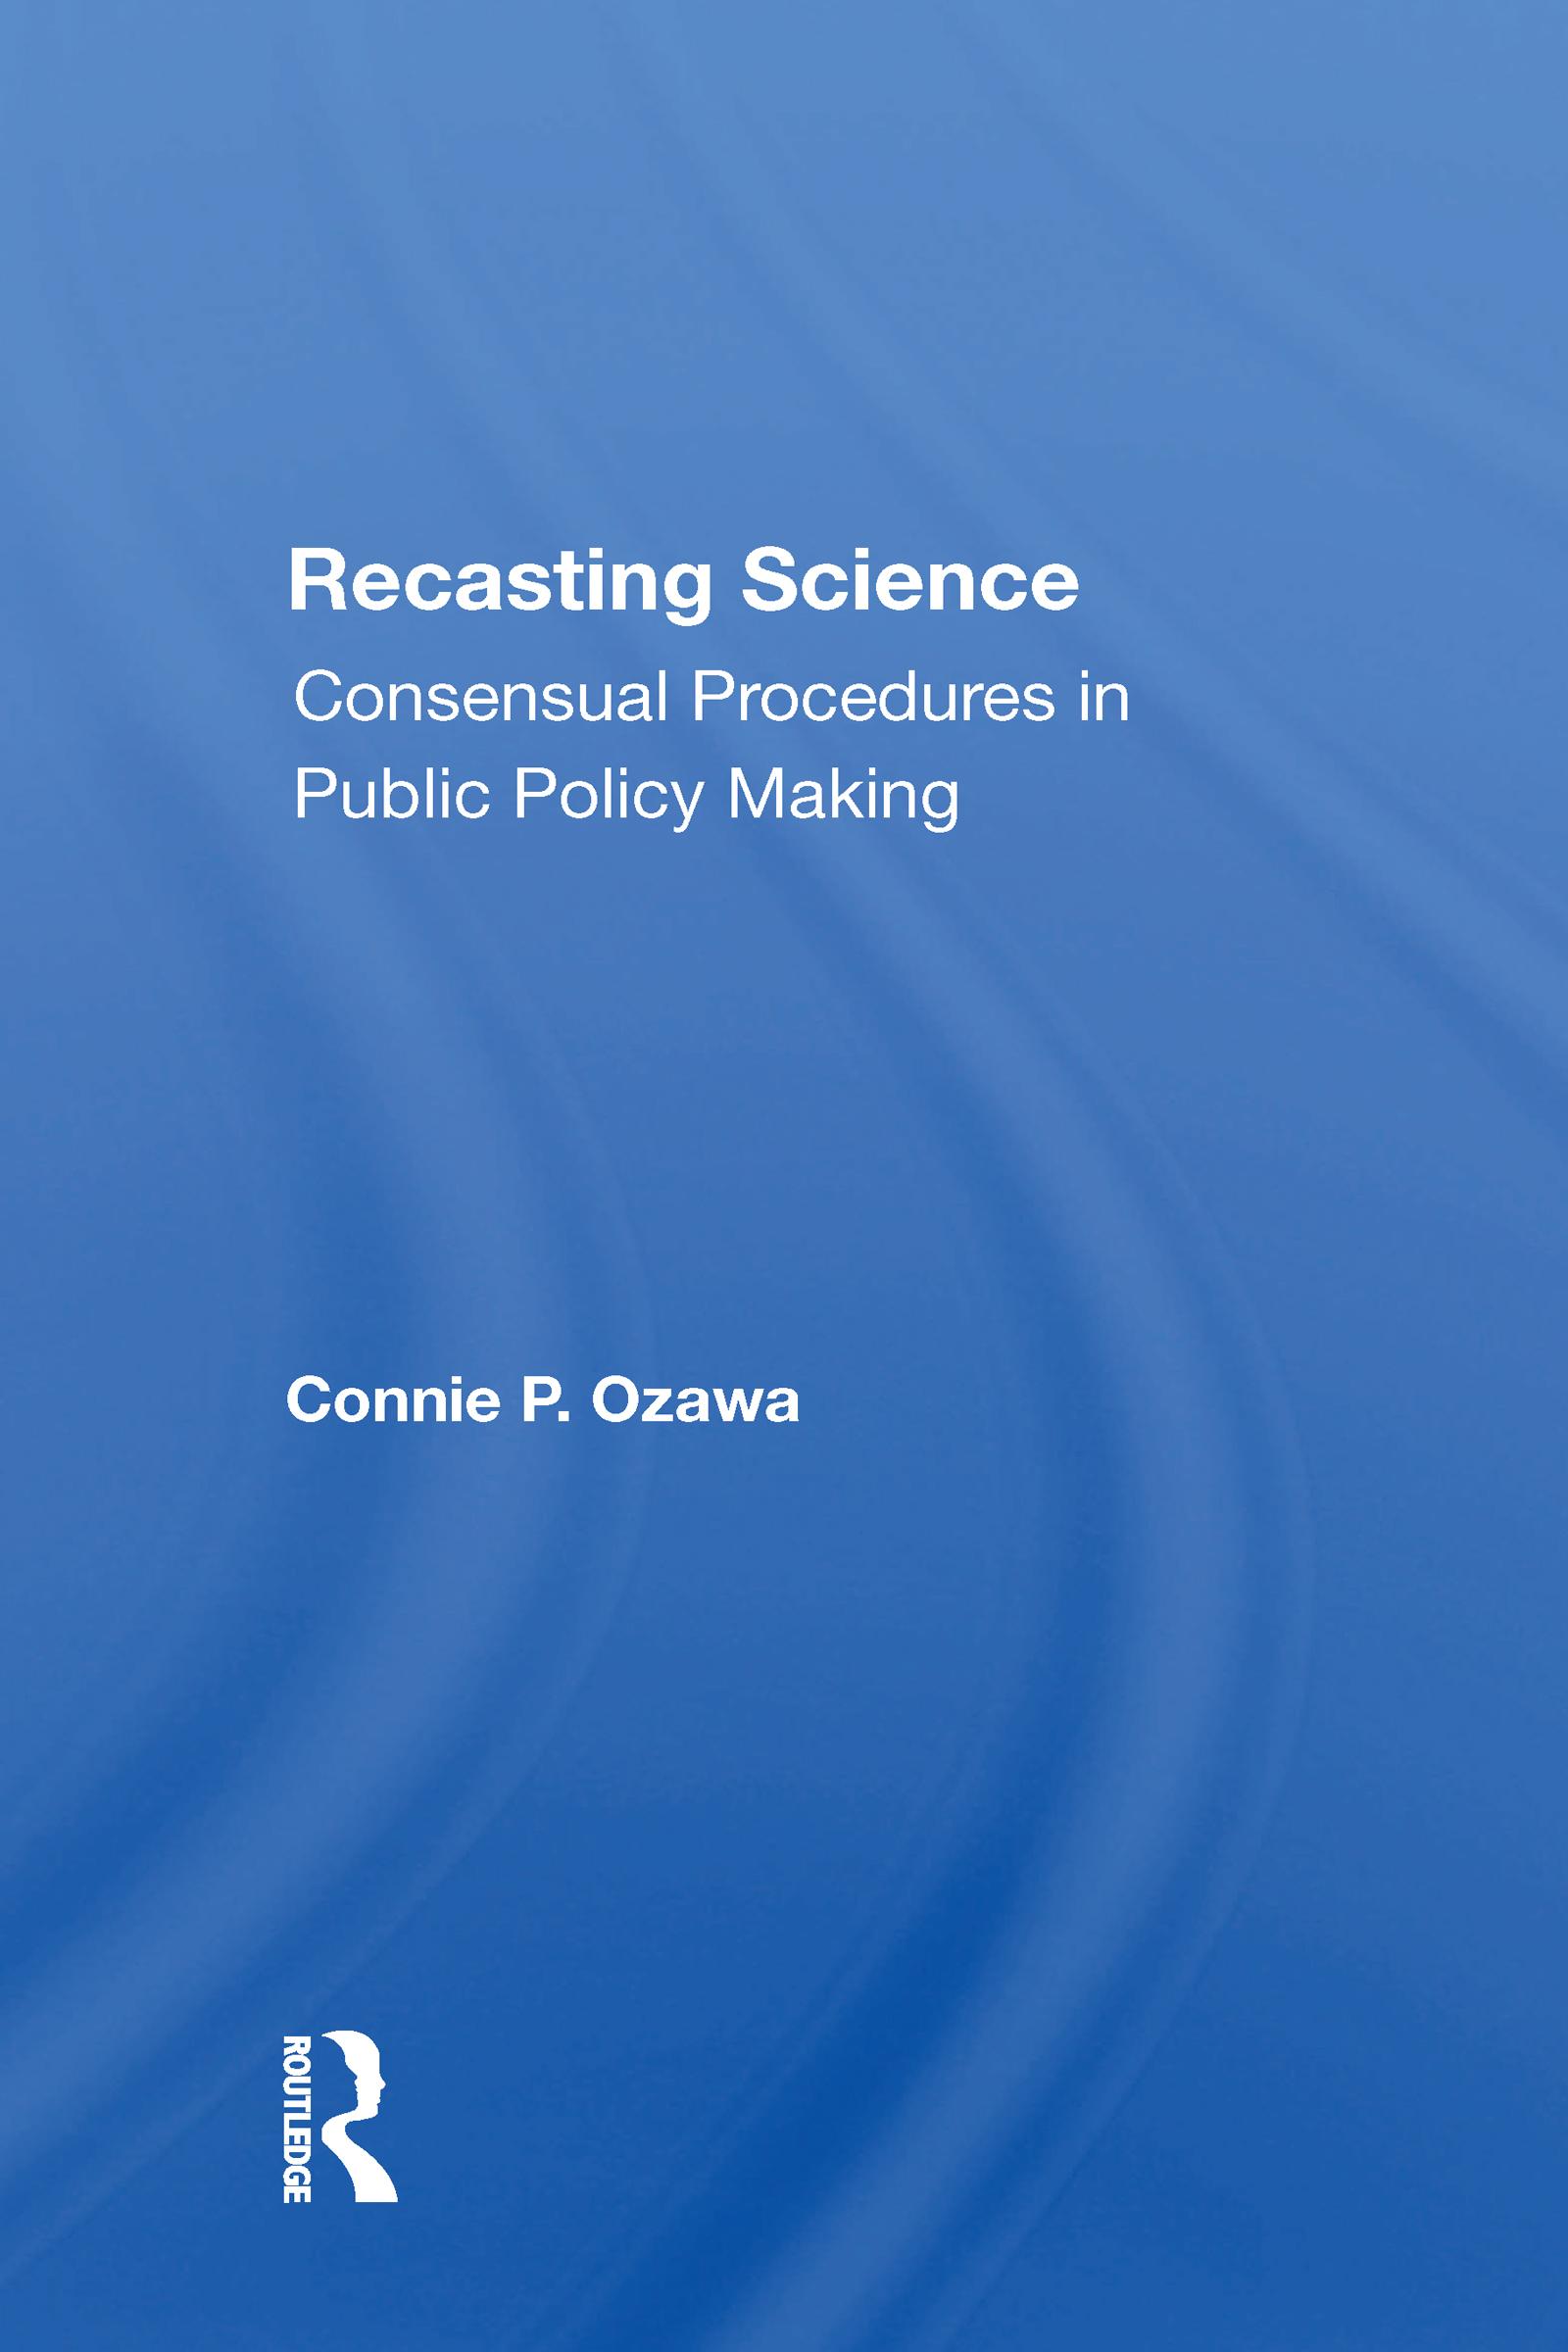 Recasting Science